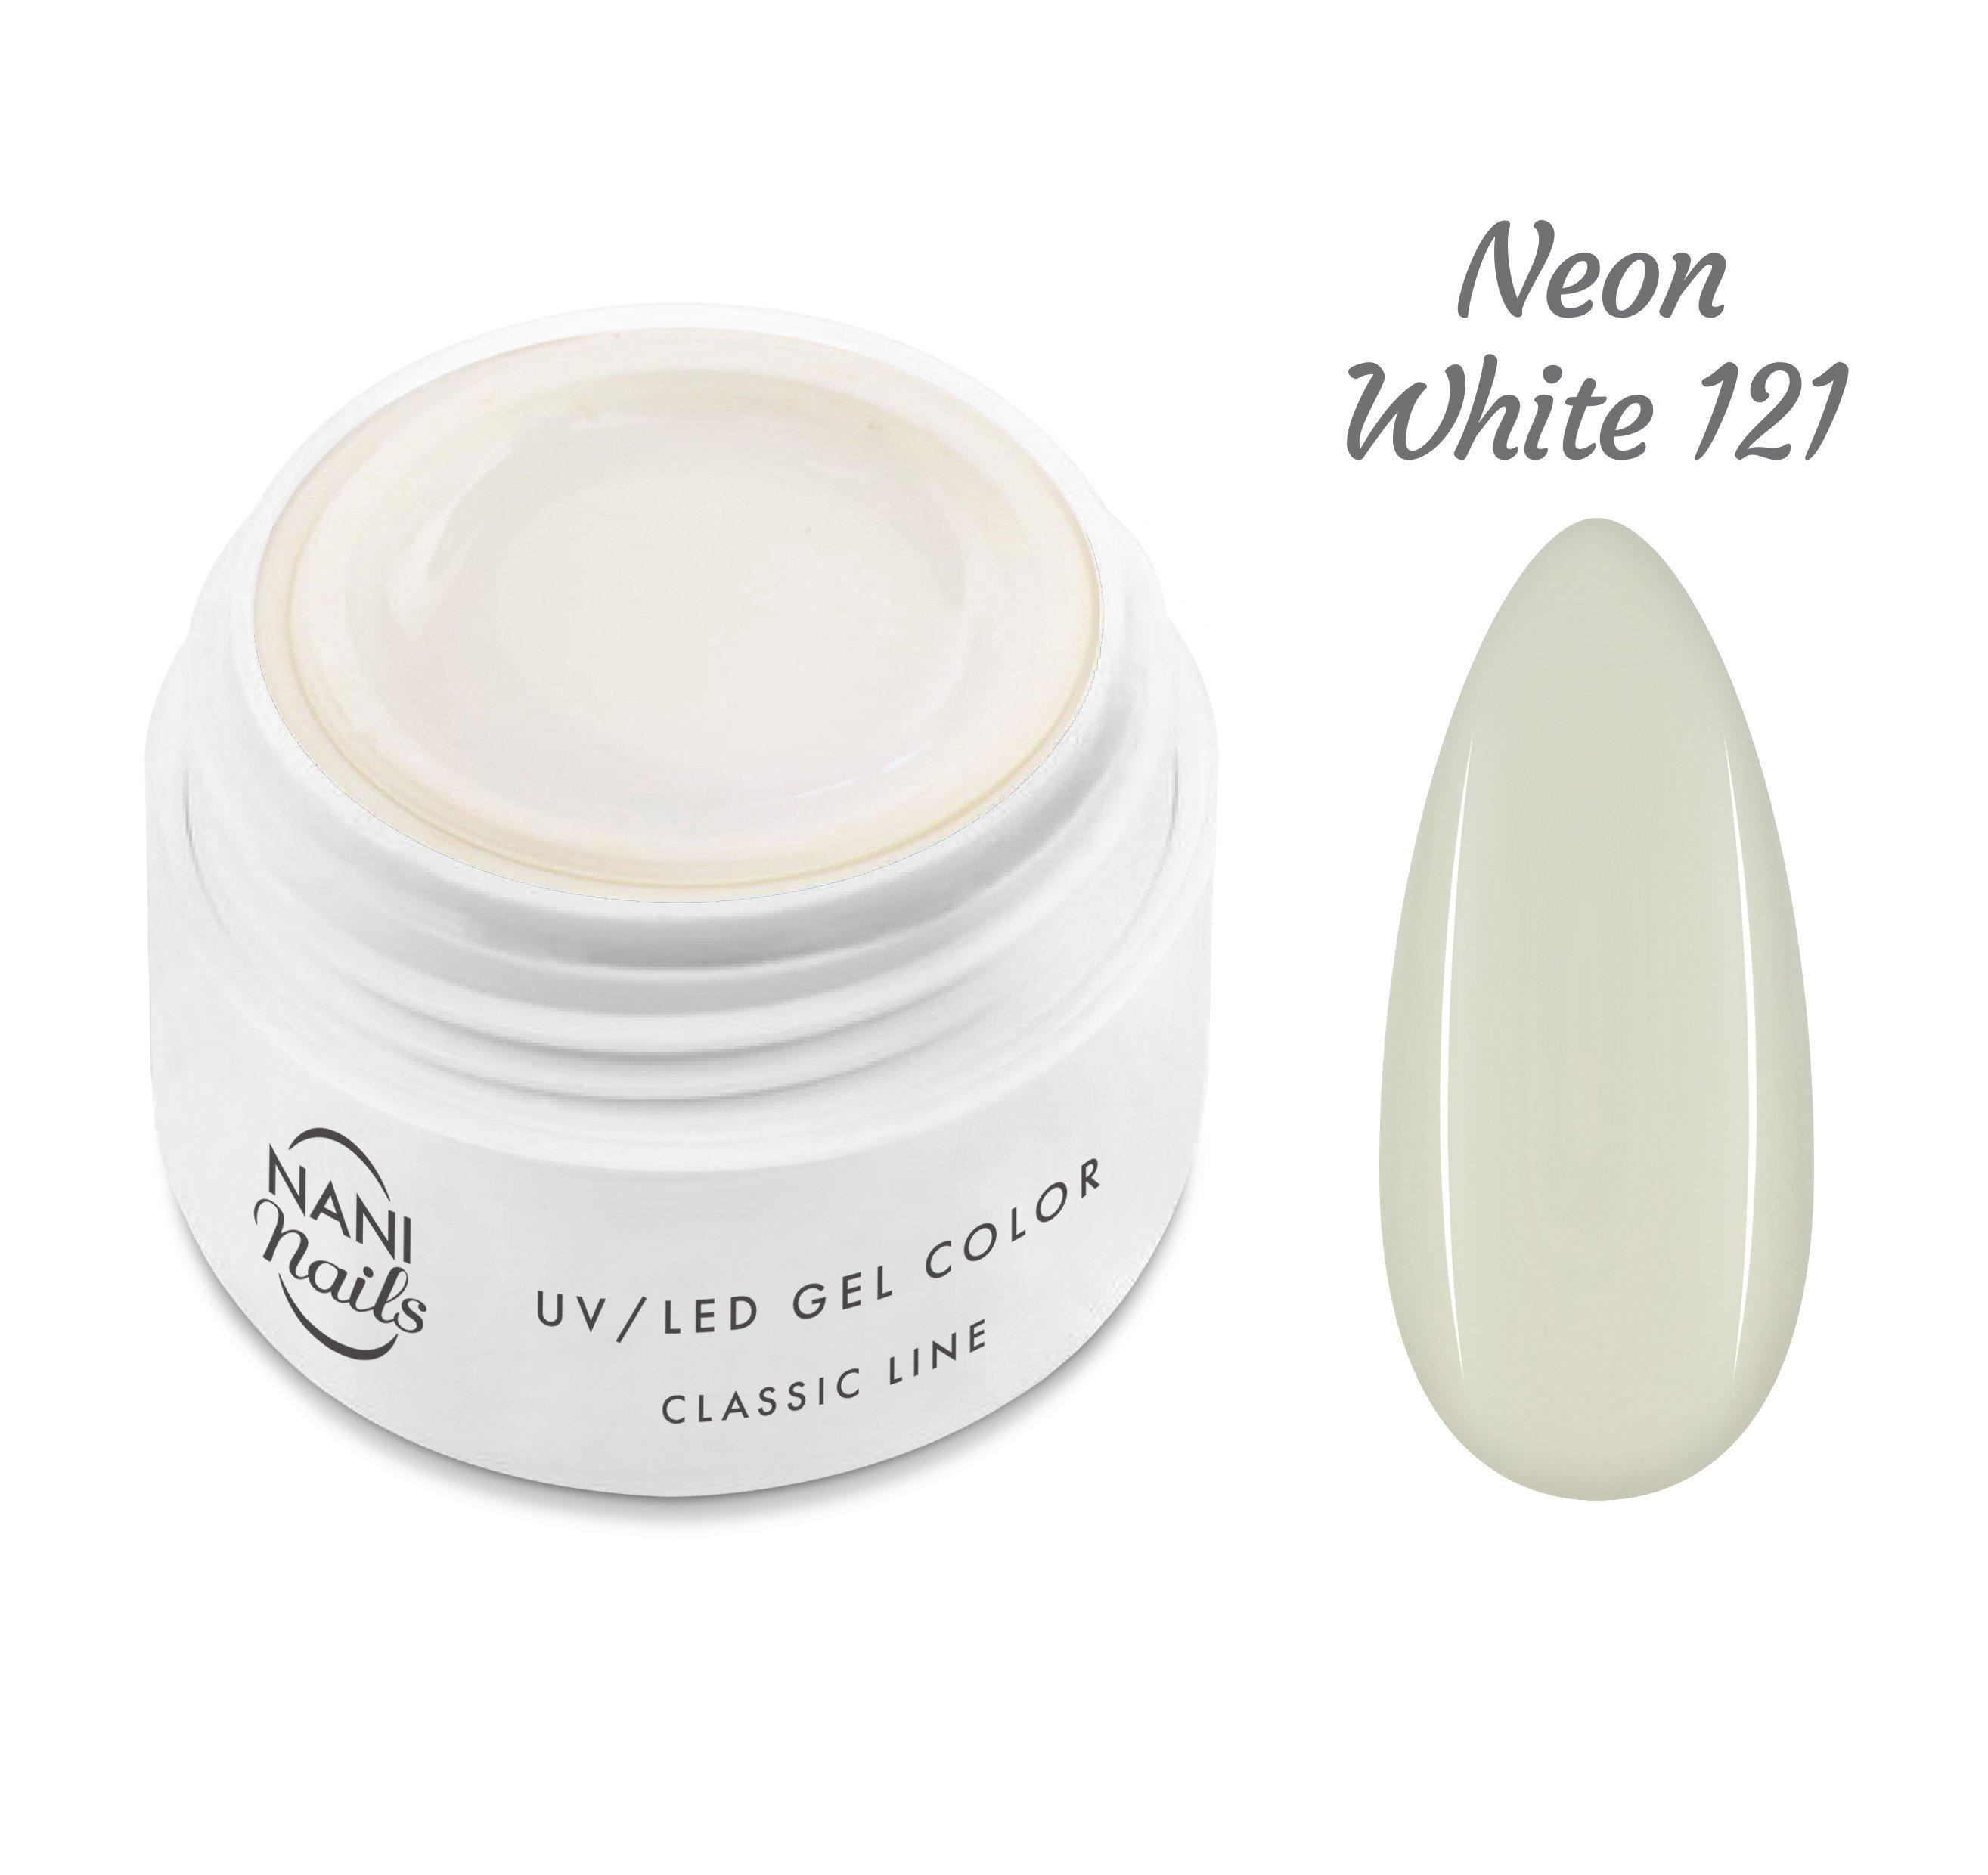 NANI UV gél Classic Line 5 ml - Neon White